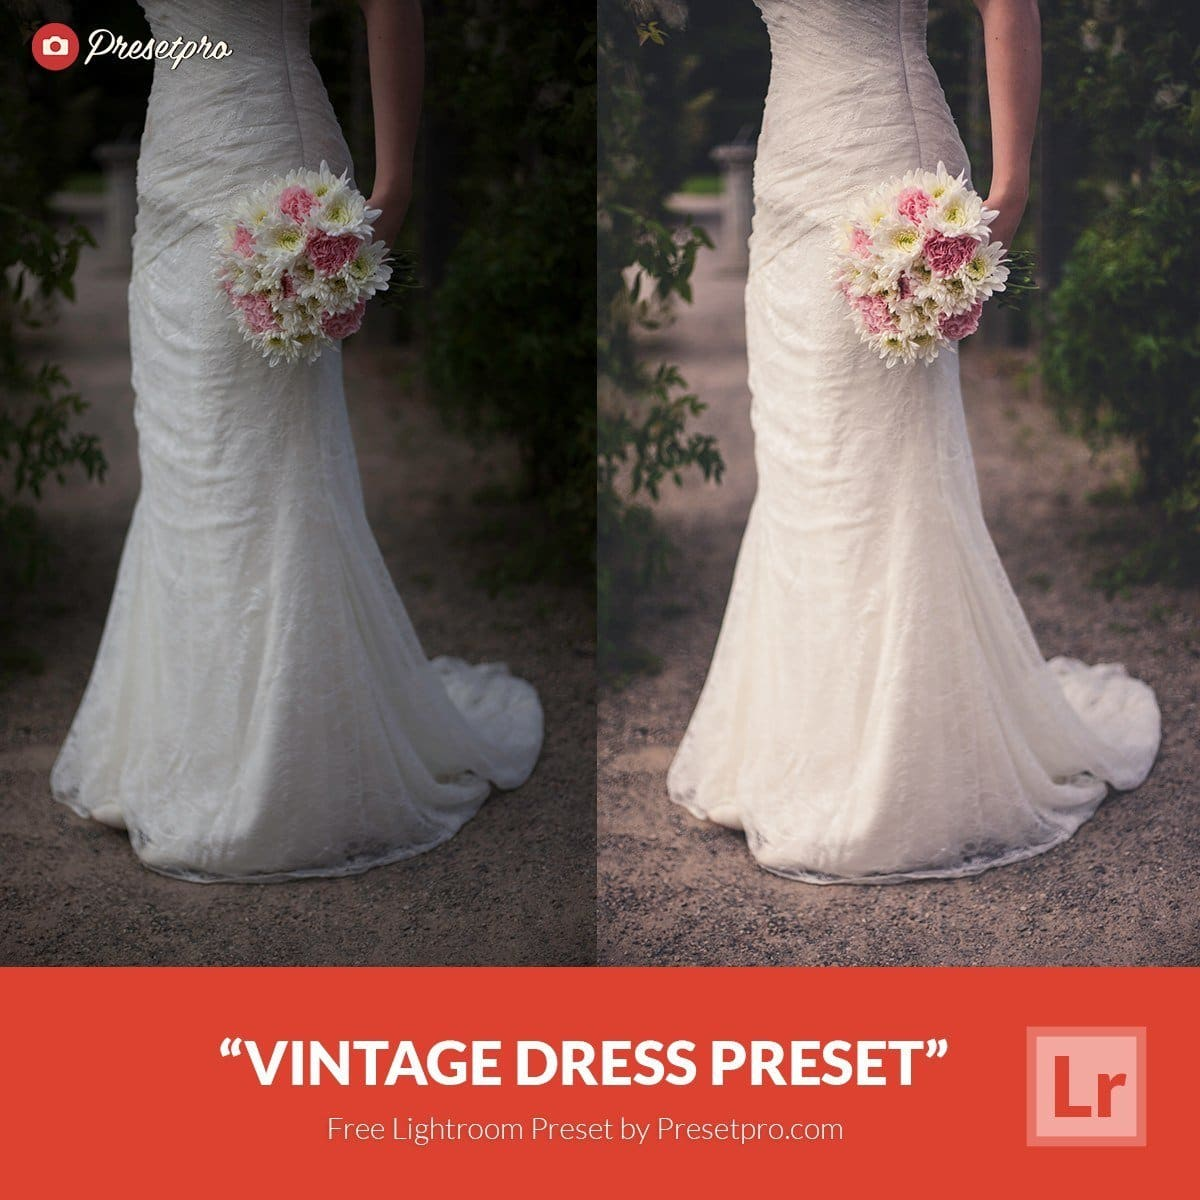 Free-Lightroom-Preset-Vintage-Dress